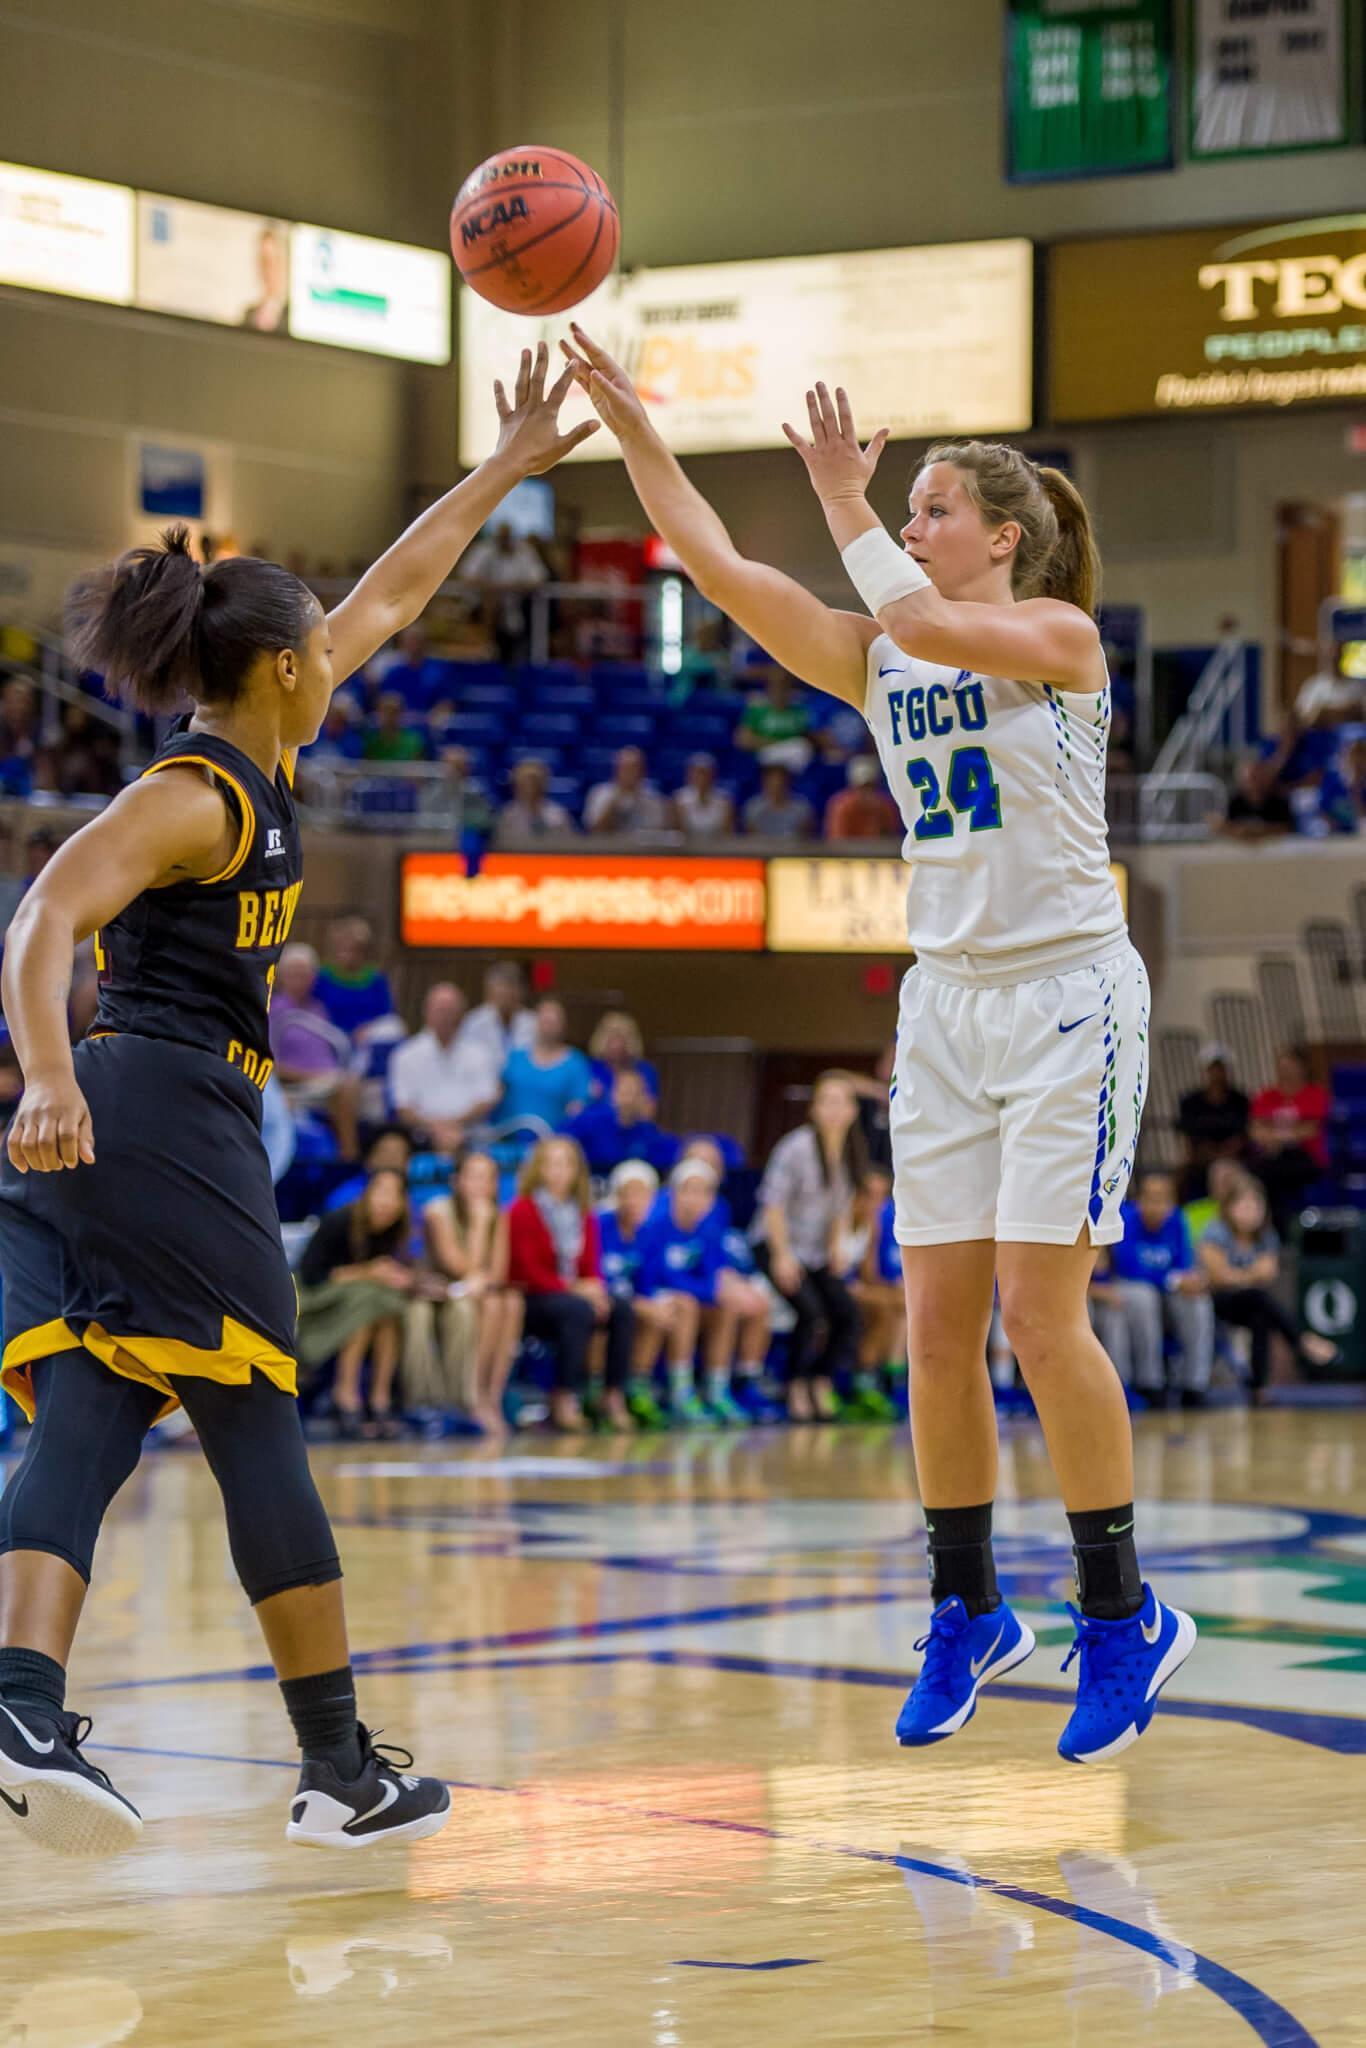 FGCU women's basketball loses to Quinnipiac in season opener